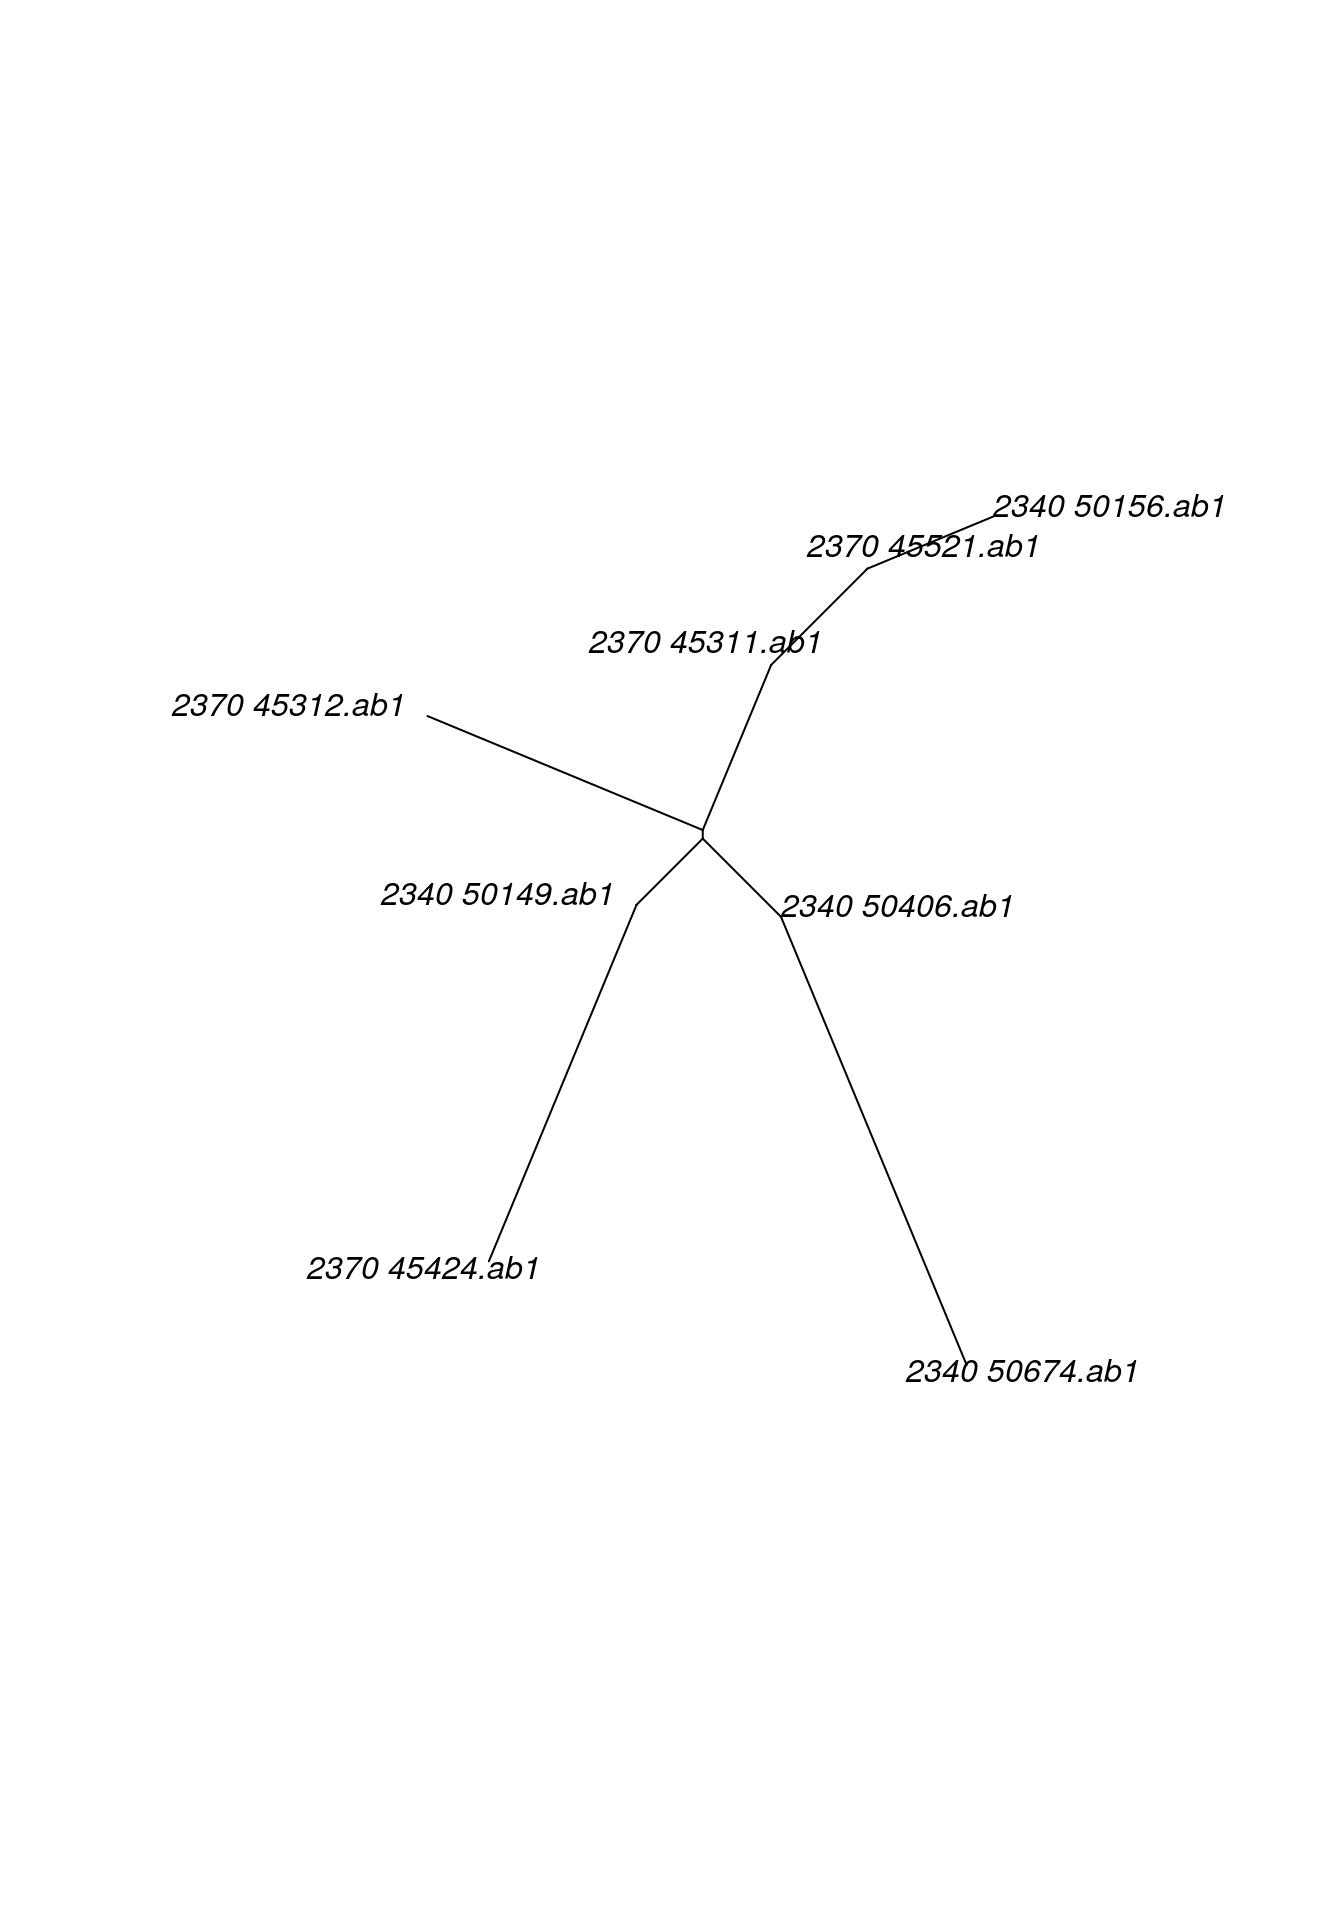 plot of chunk plotPhyloSingle